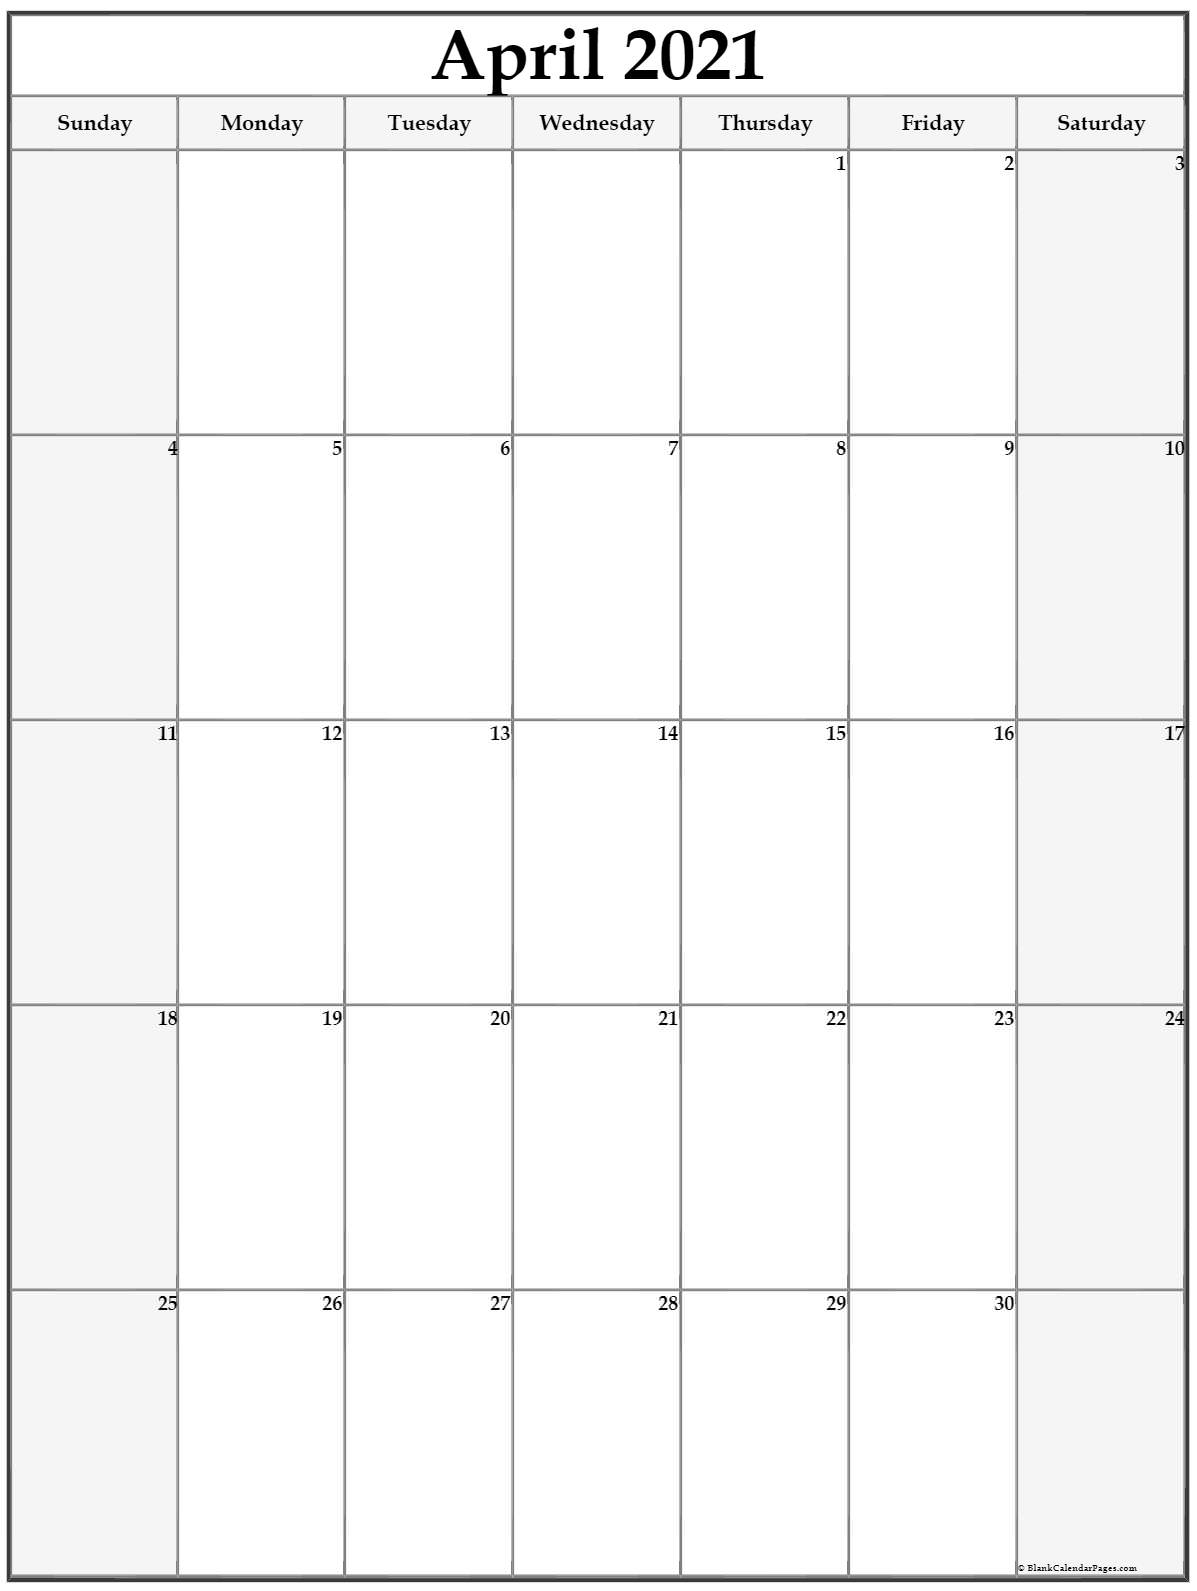 April 2021 Vertical Calendar